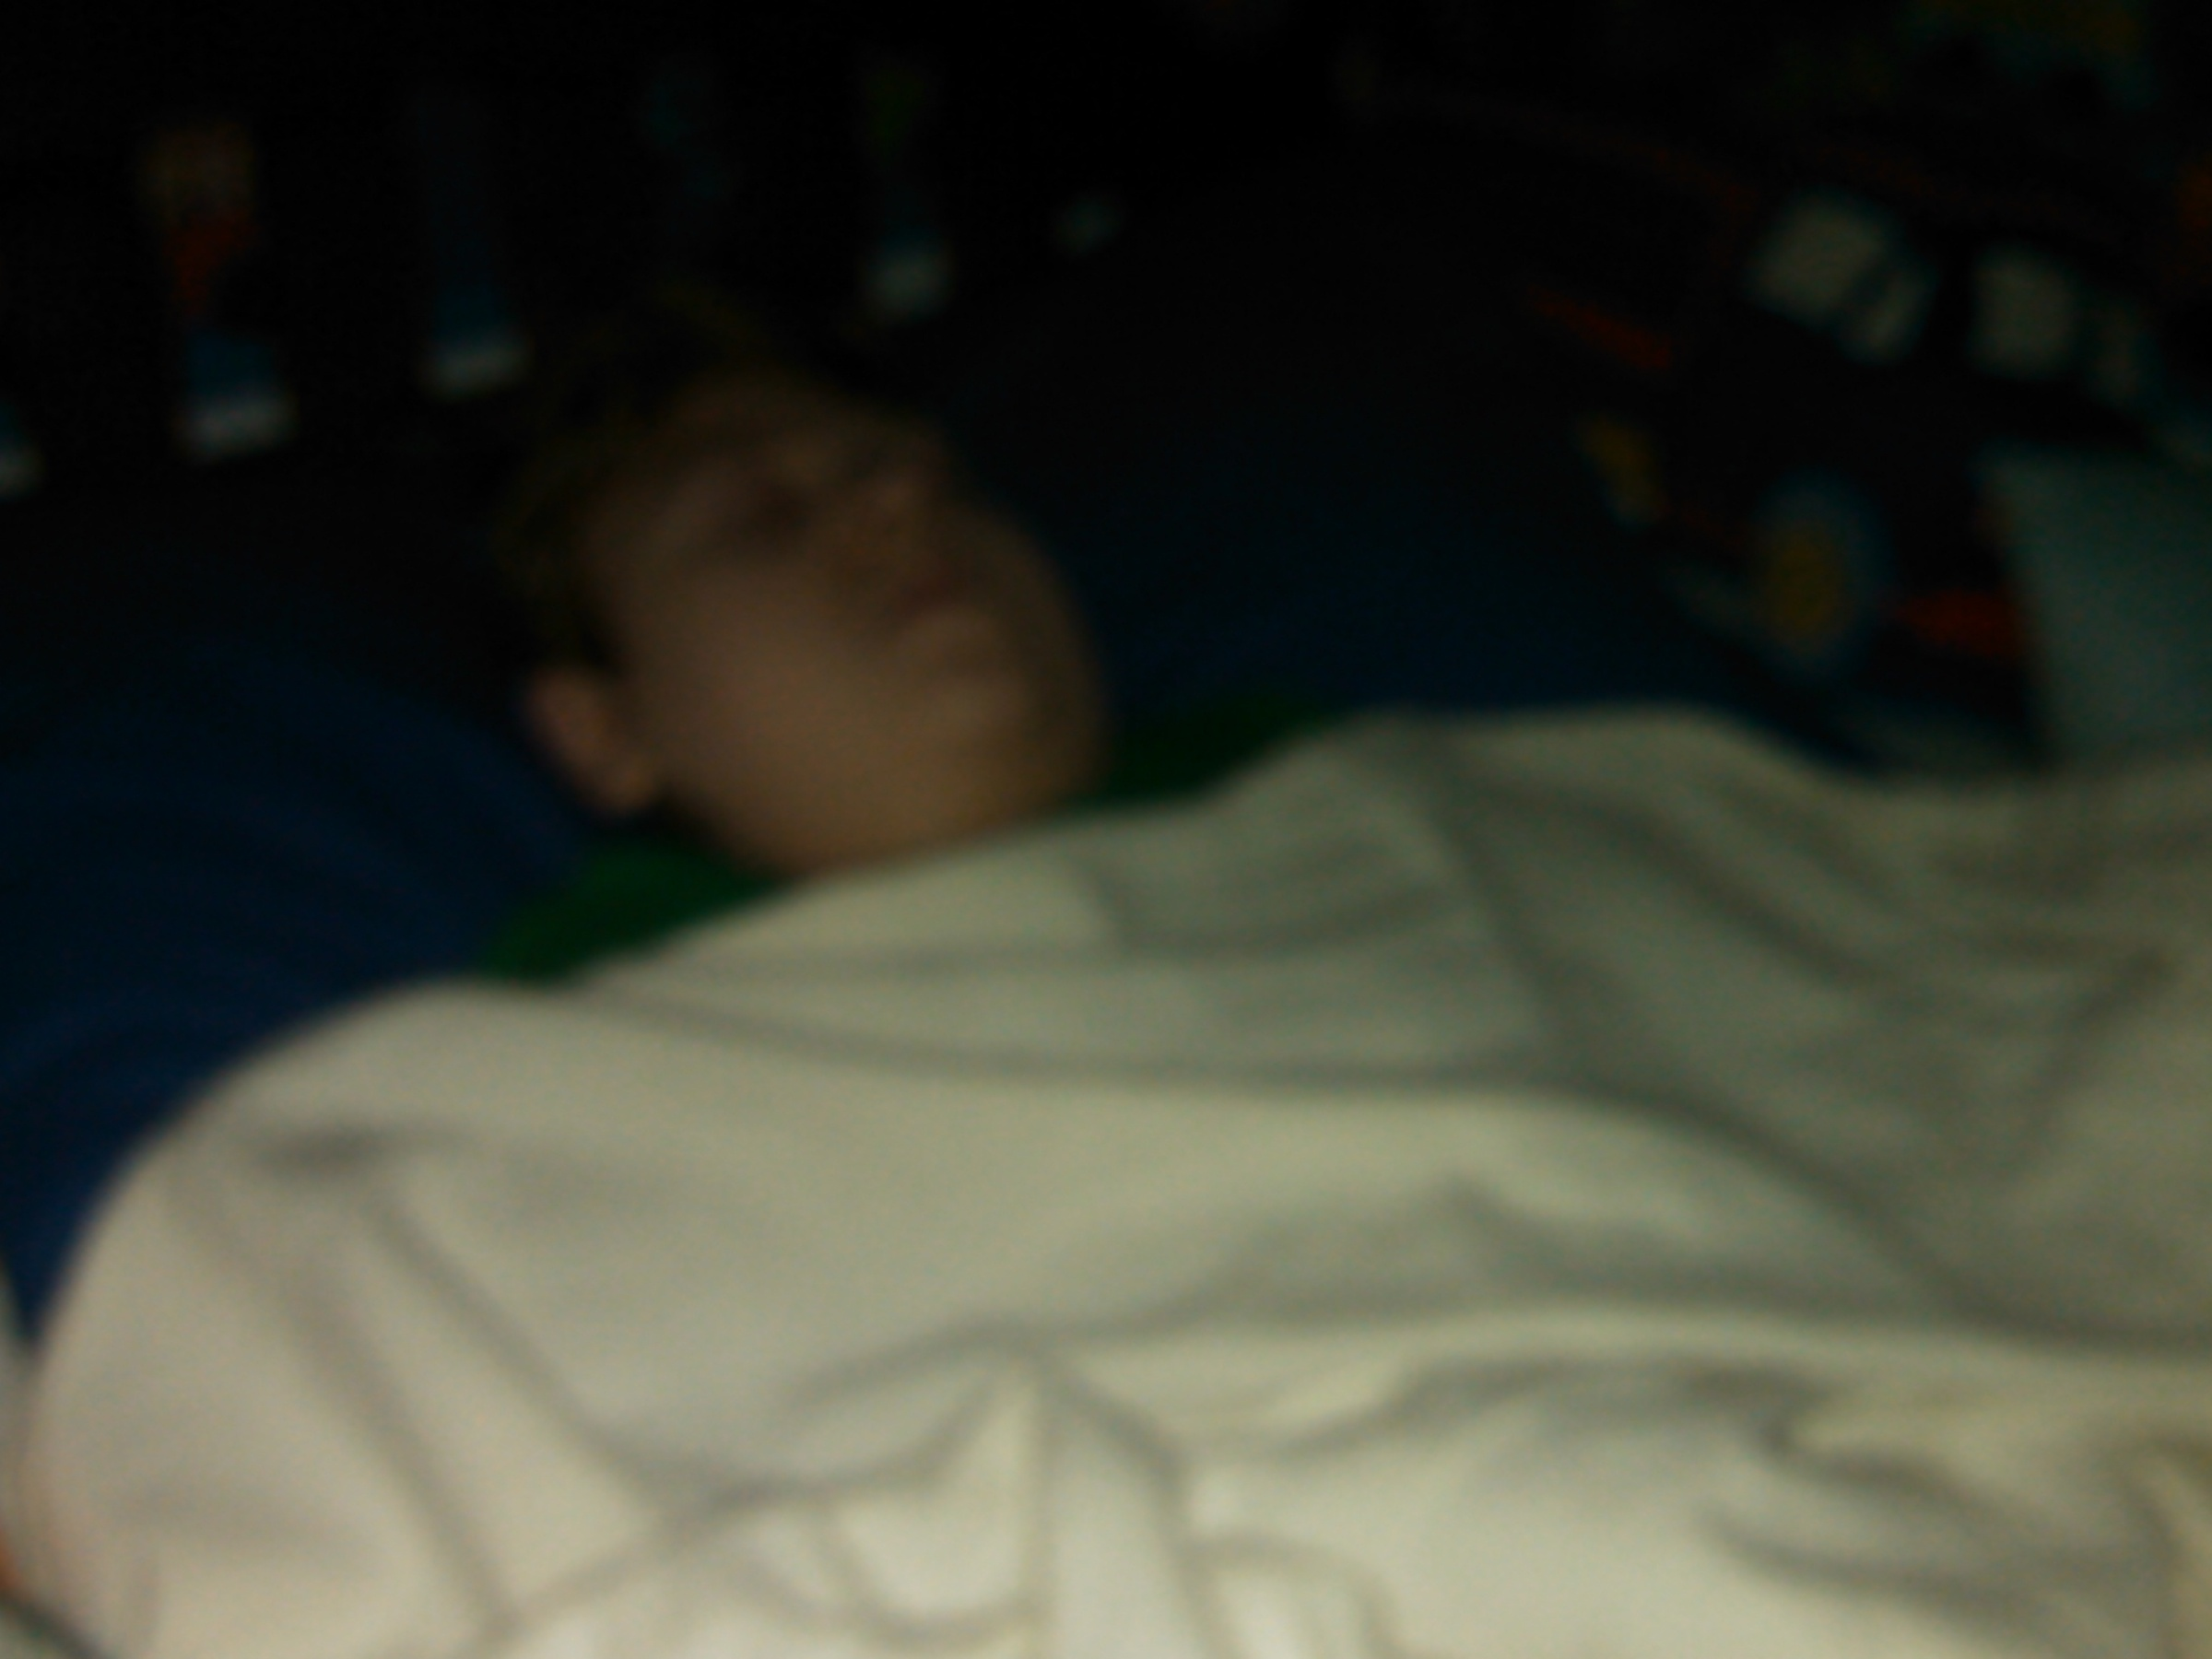 J.P. sleeping